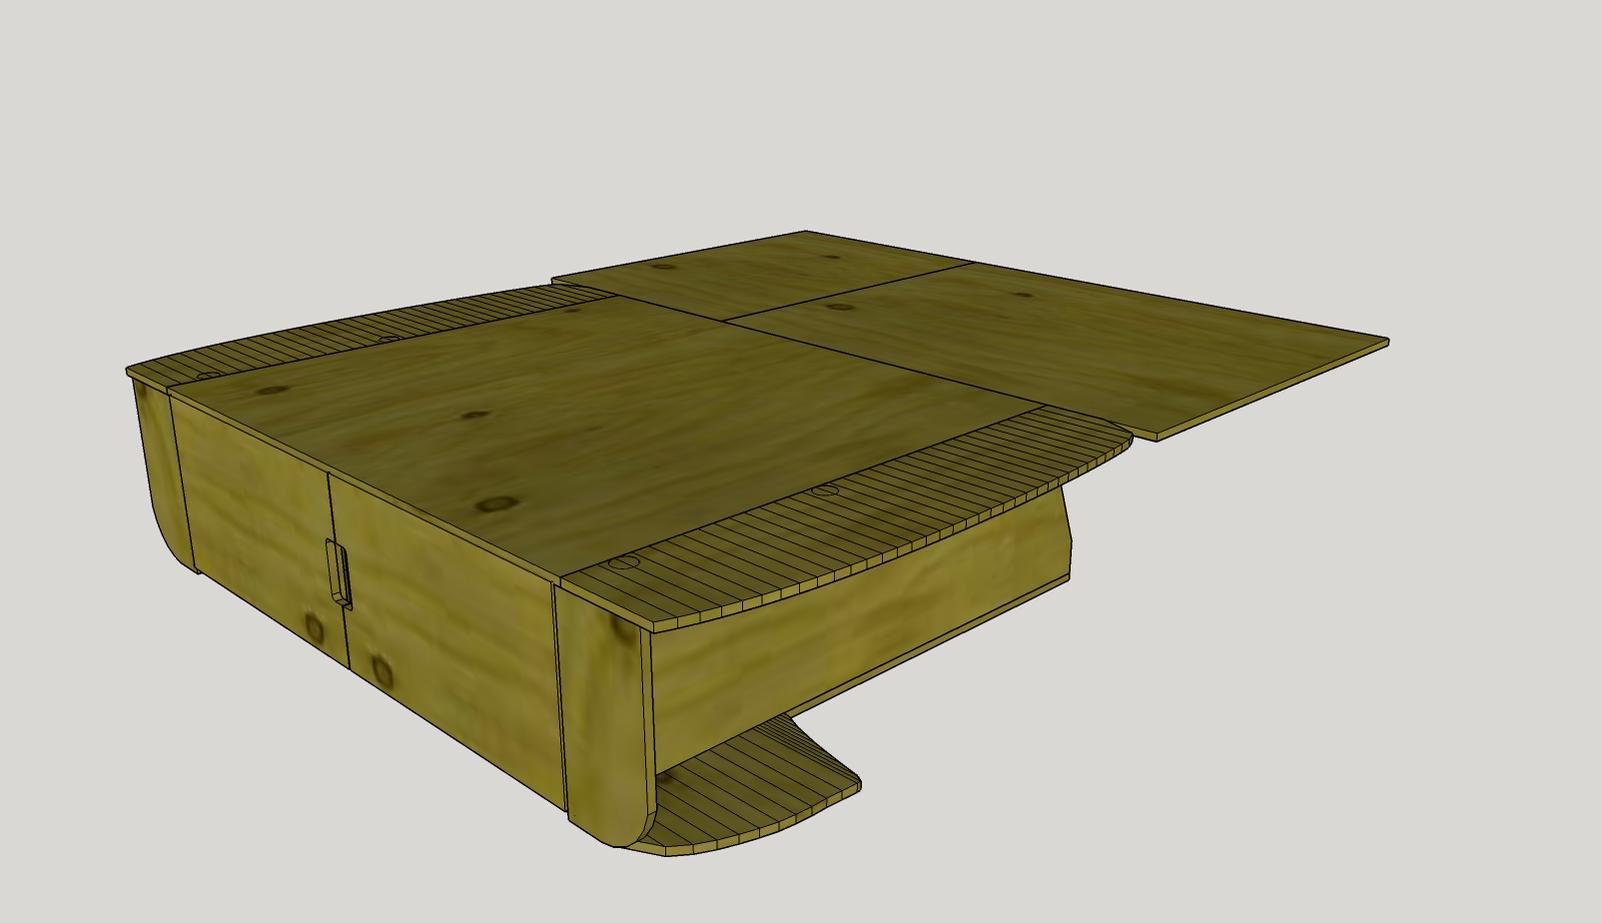 4th Gen Camping/Storage System - DIY- Free plans!-rm_4gent4rdrawers4_platformlegsiso-jpg